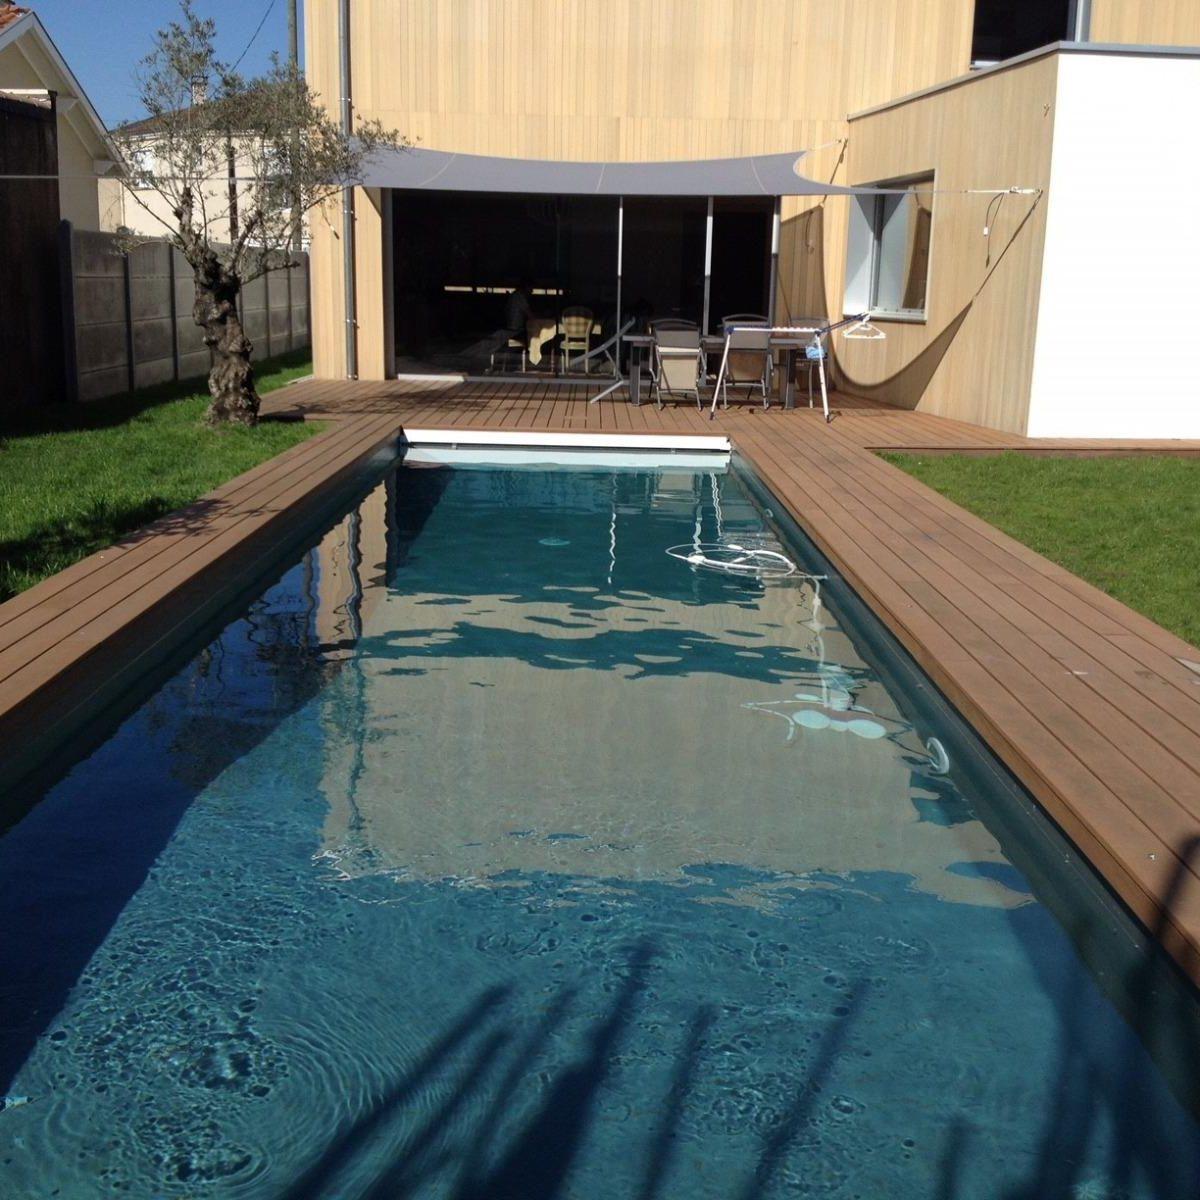 construire une piscine enterrée en béton